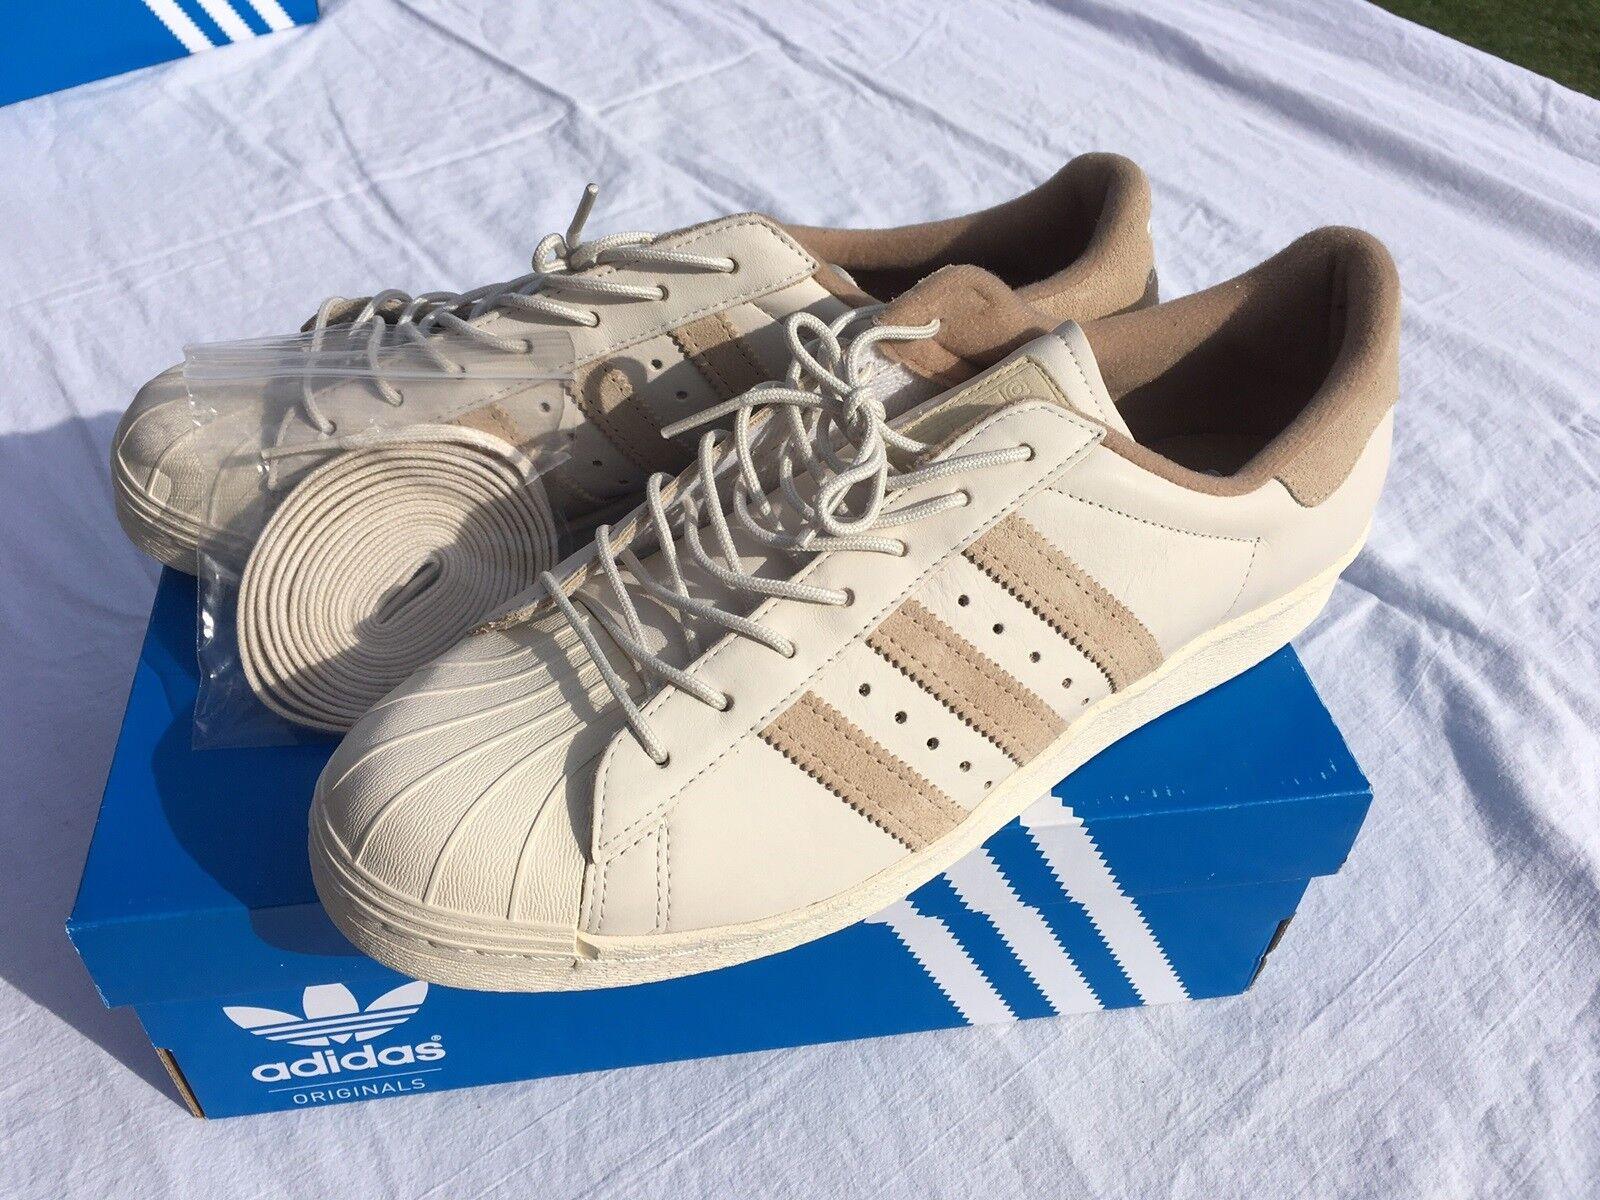 Sneakers, Adidas, str. 46, Grå, Ruskind